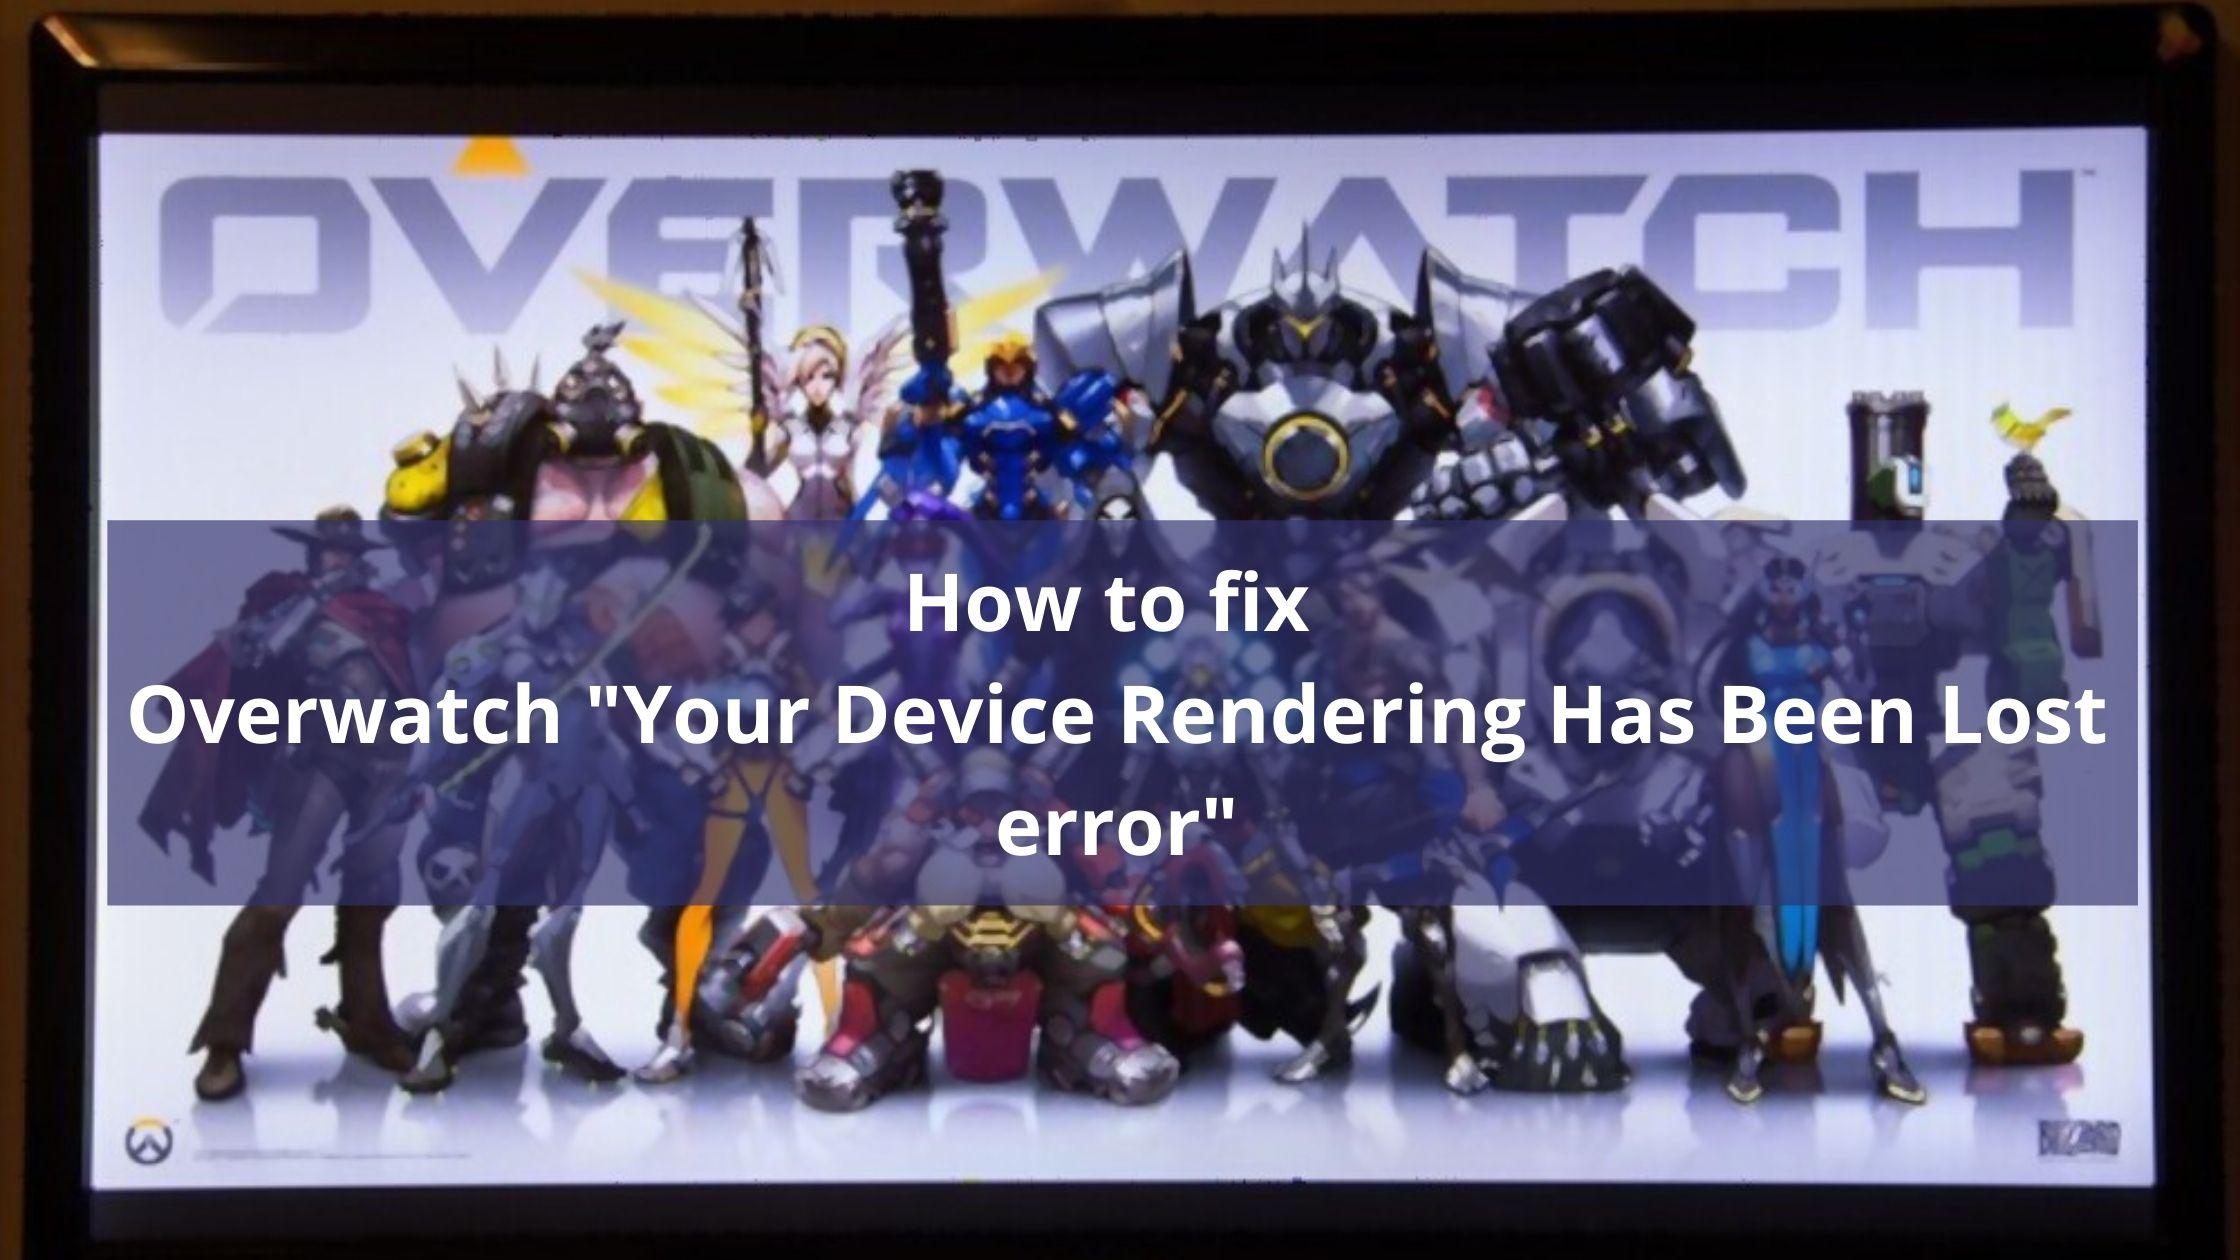 Fix your device rendering has bee lost in Overwatch